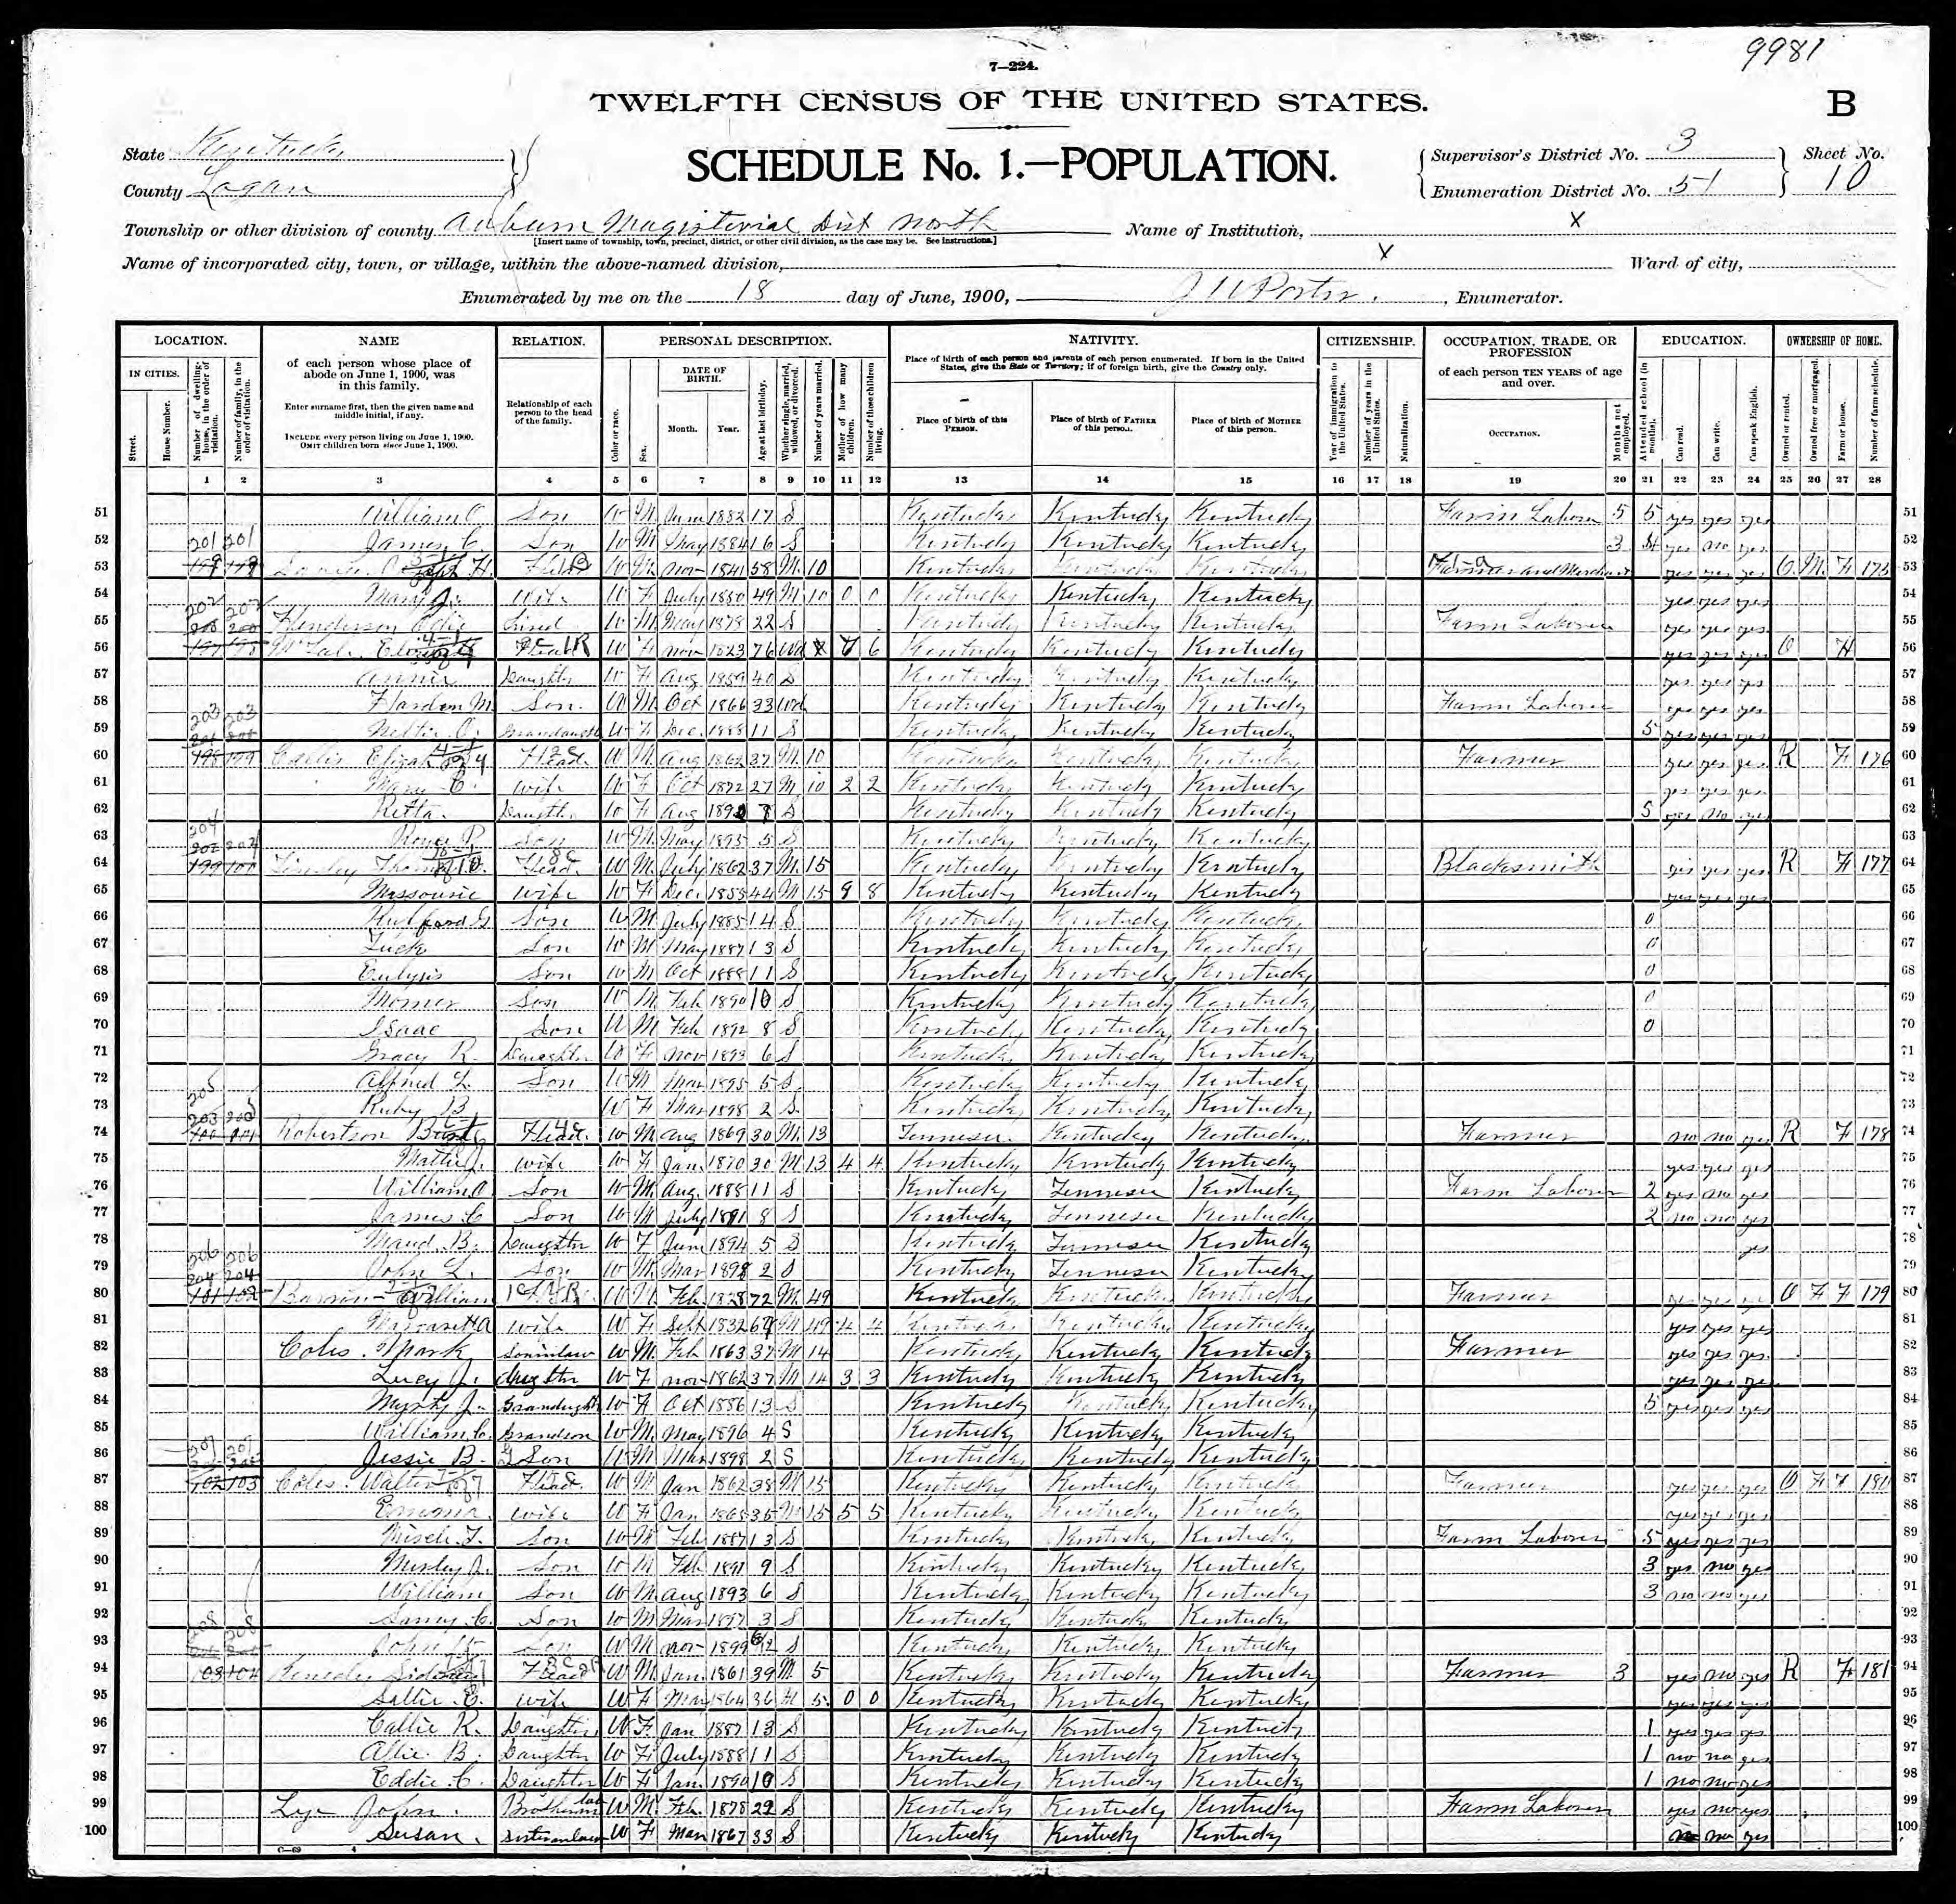 Elizabeth Mcfale discovered in 1900 United States Federal